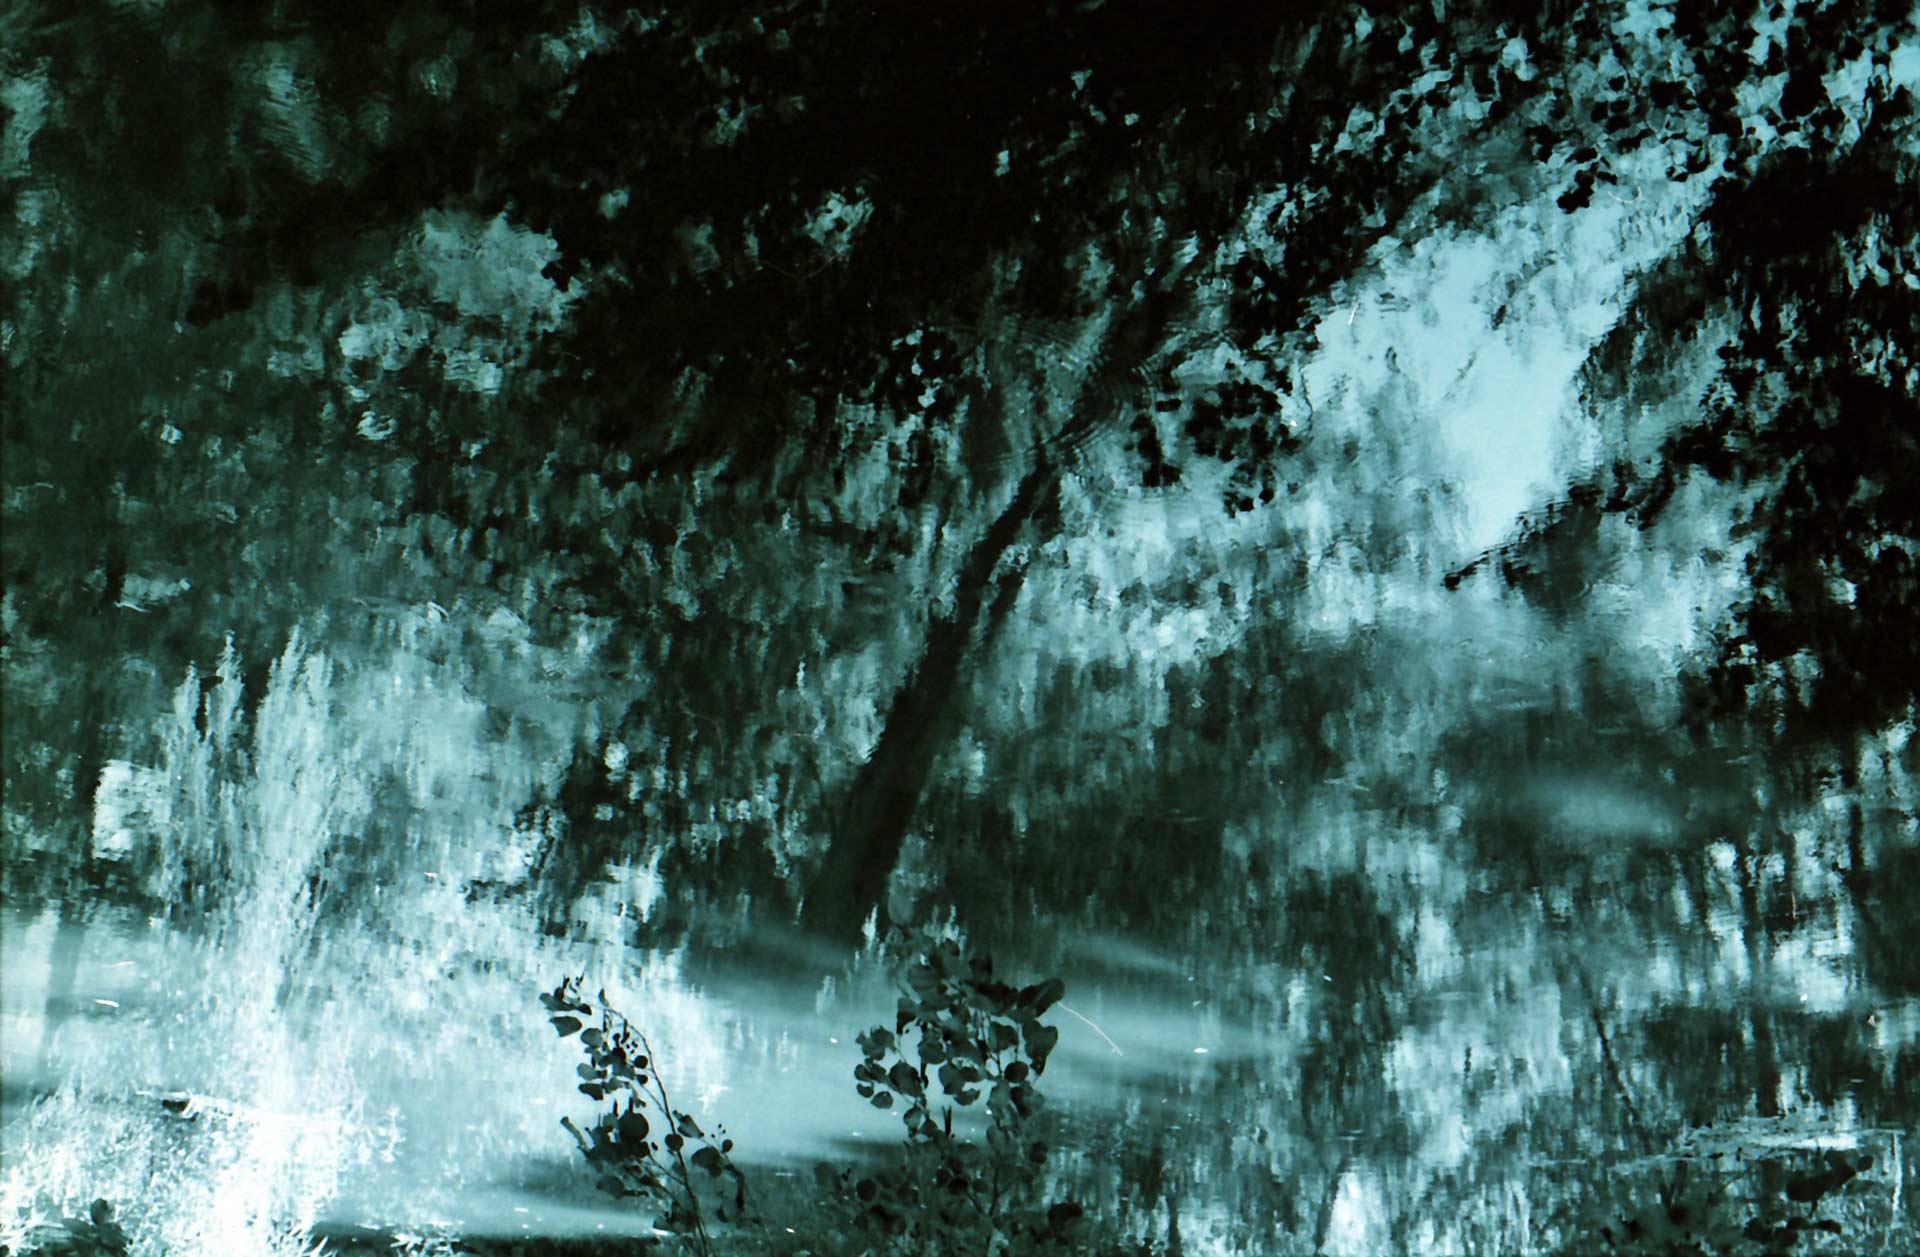 Natural equivalences n°1 - San Leonardo de Siete Fuentes 2005